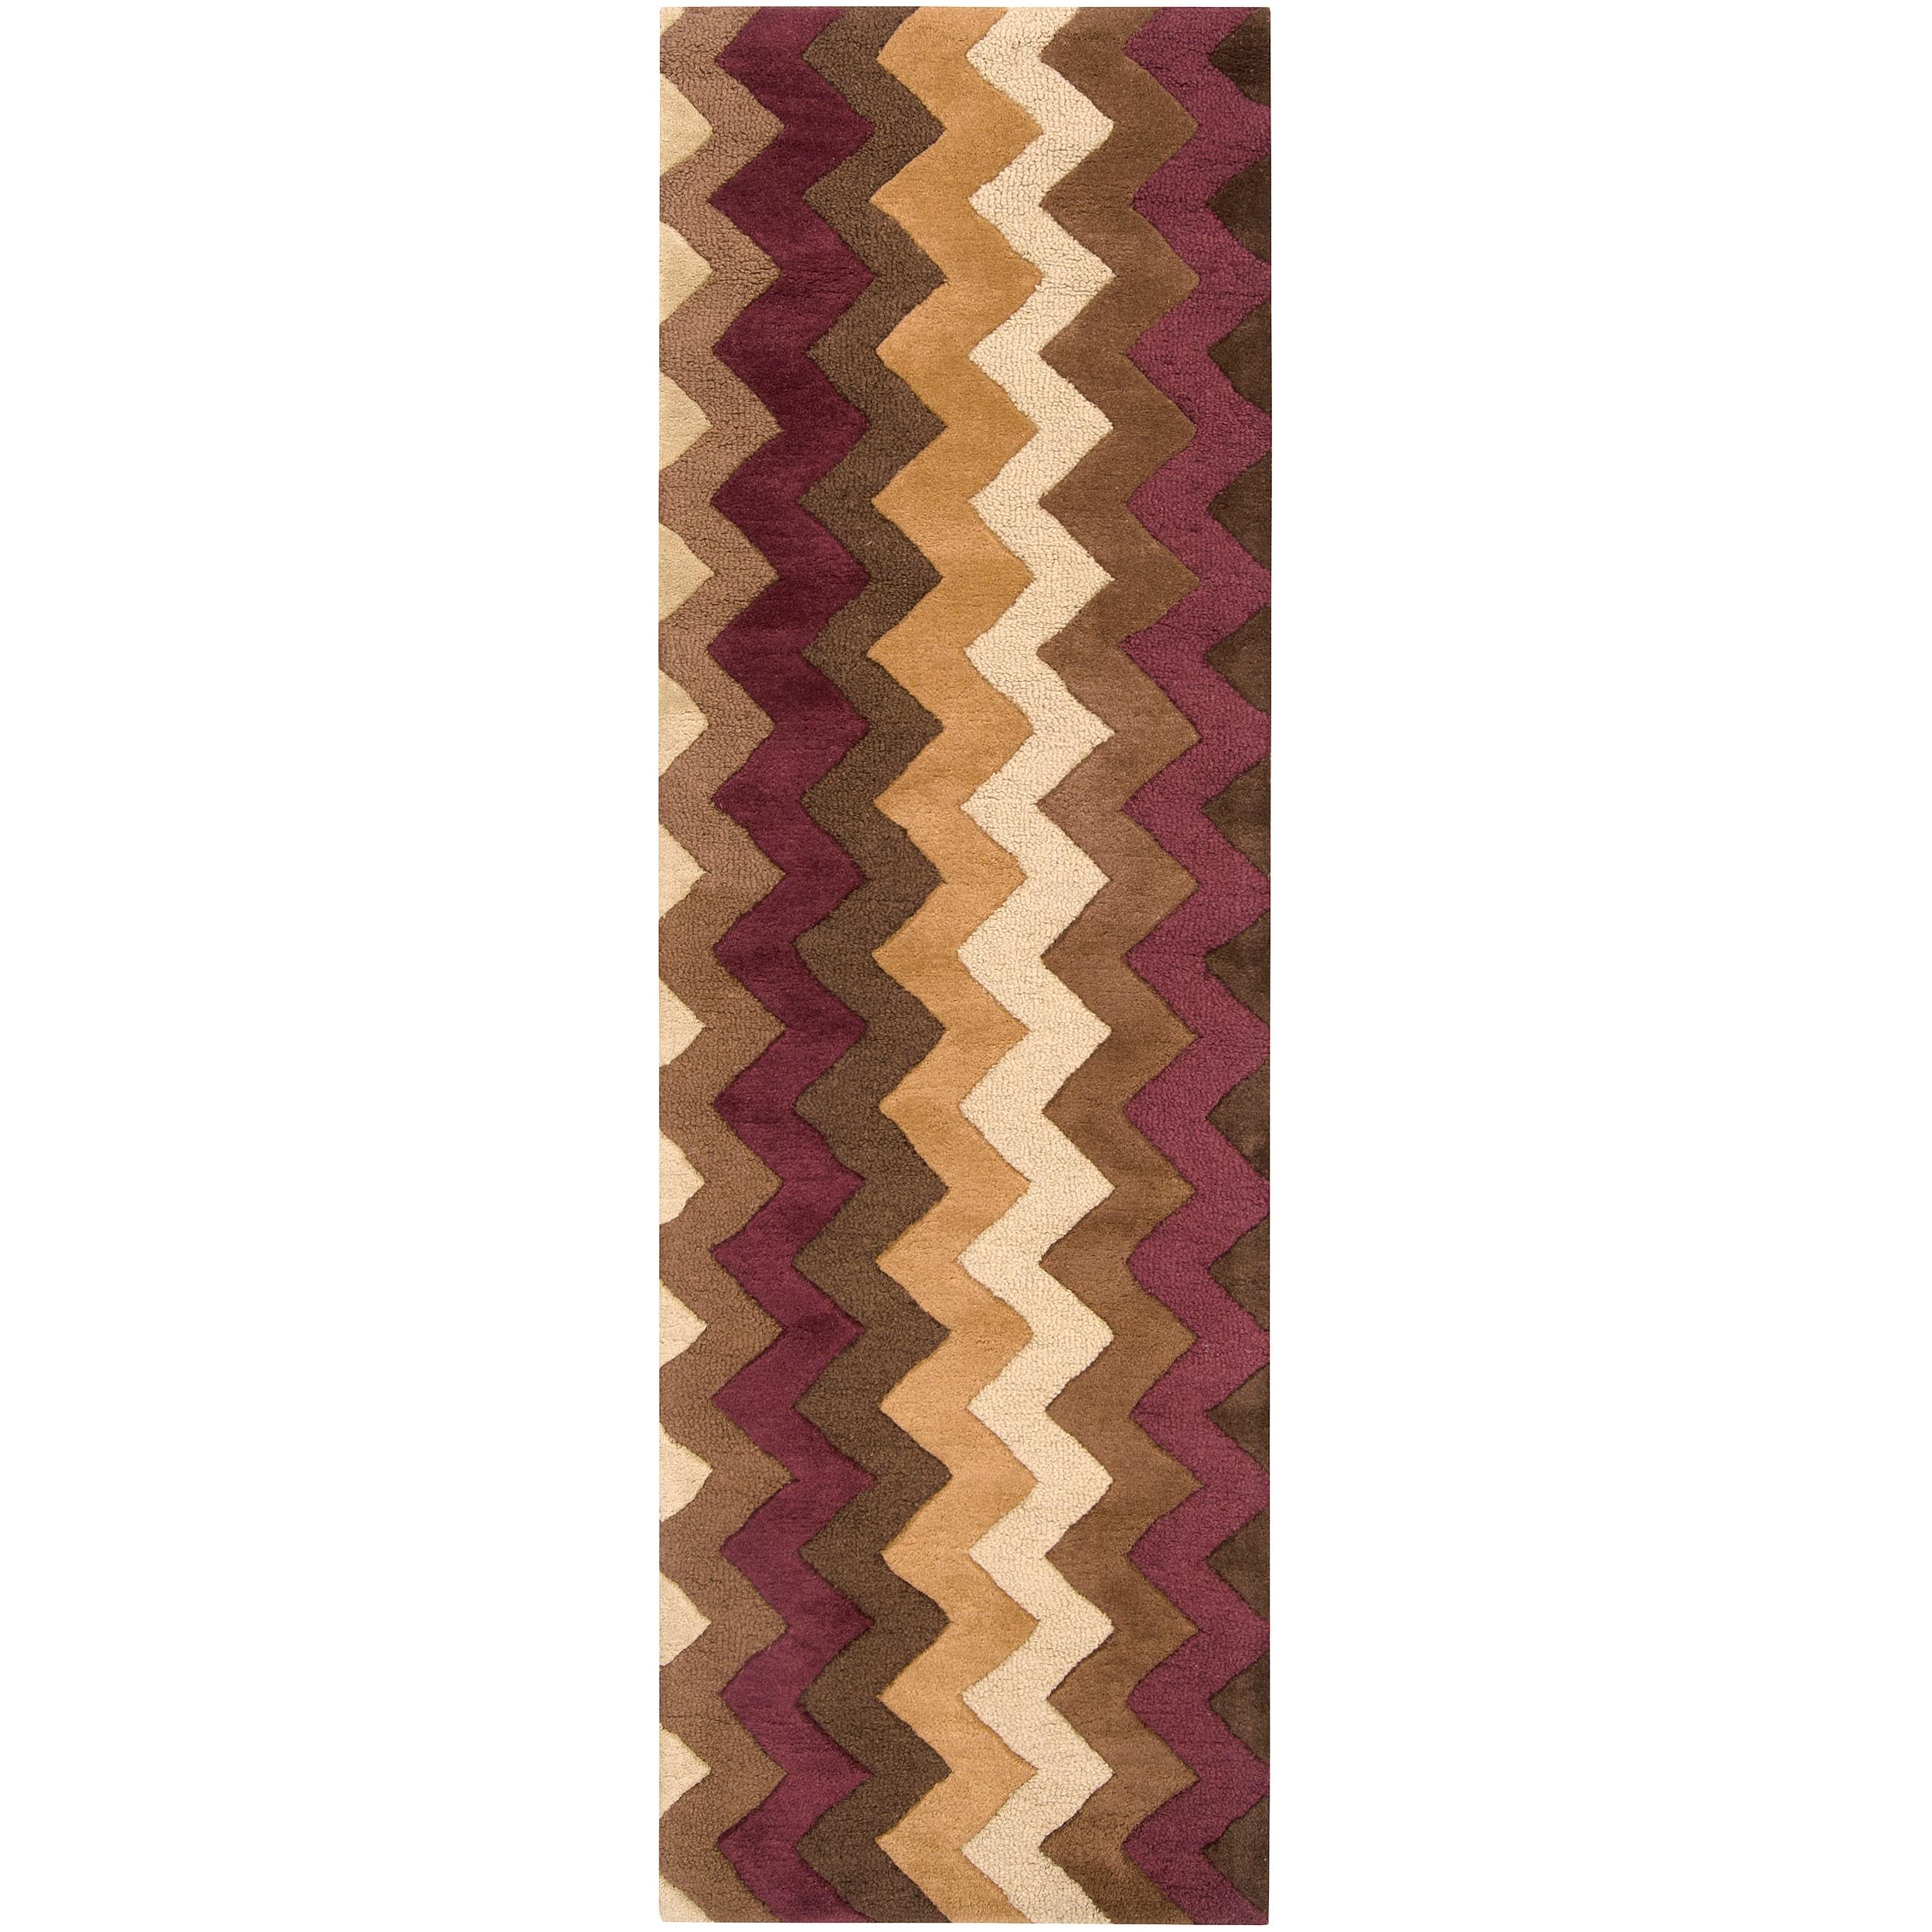 Hand-tufted Brown Krugman New Zealand Wool Rug (2'6 x 8')